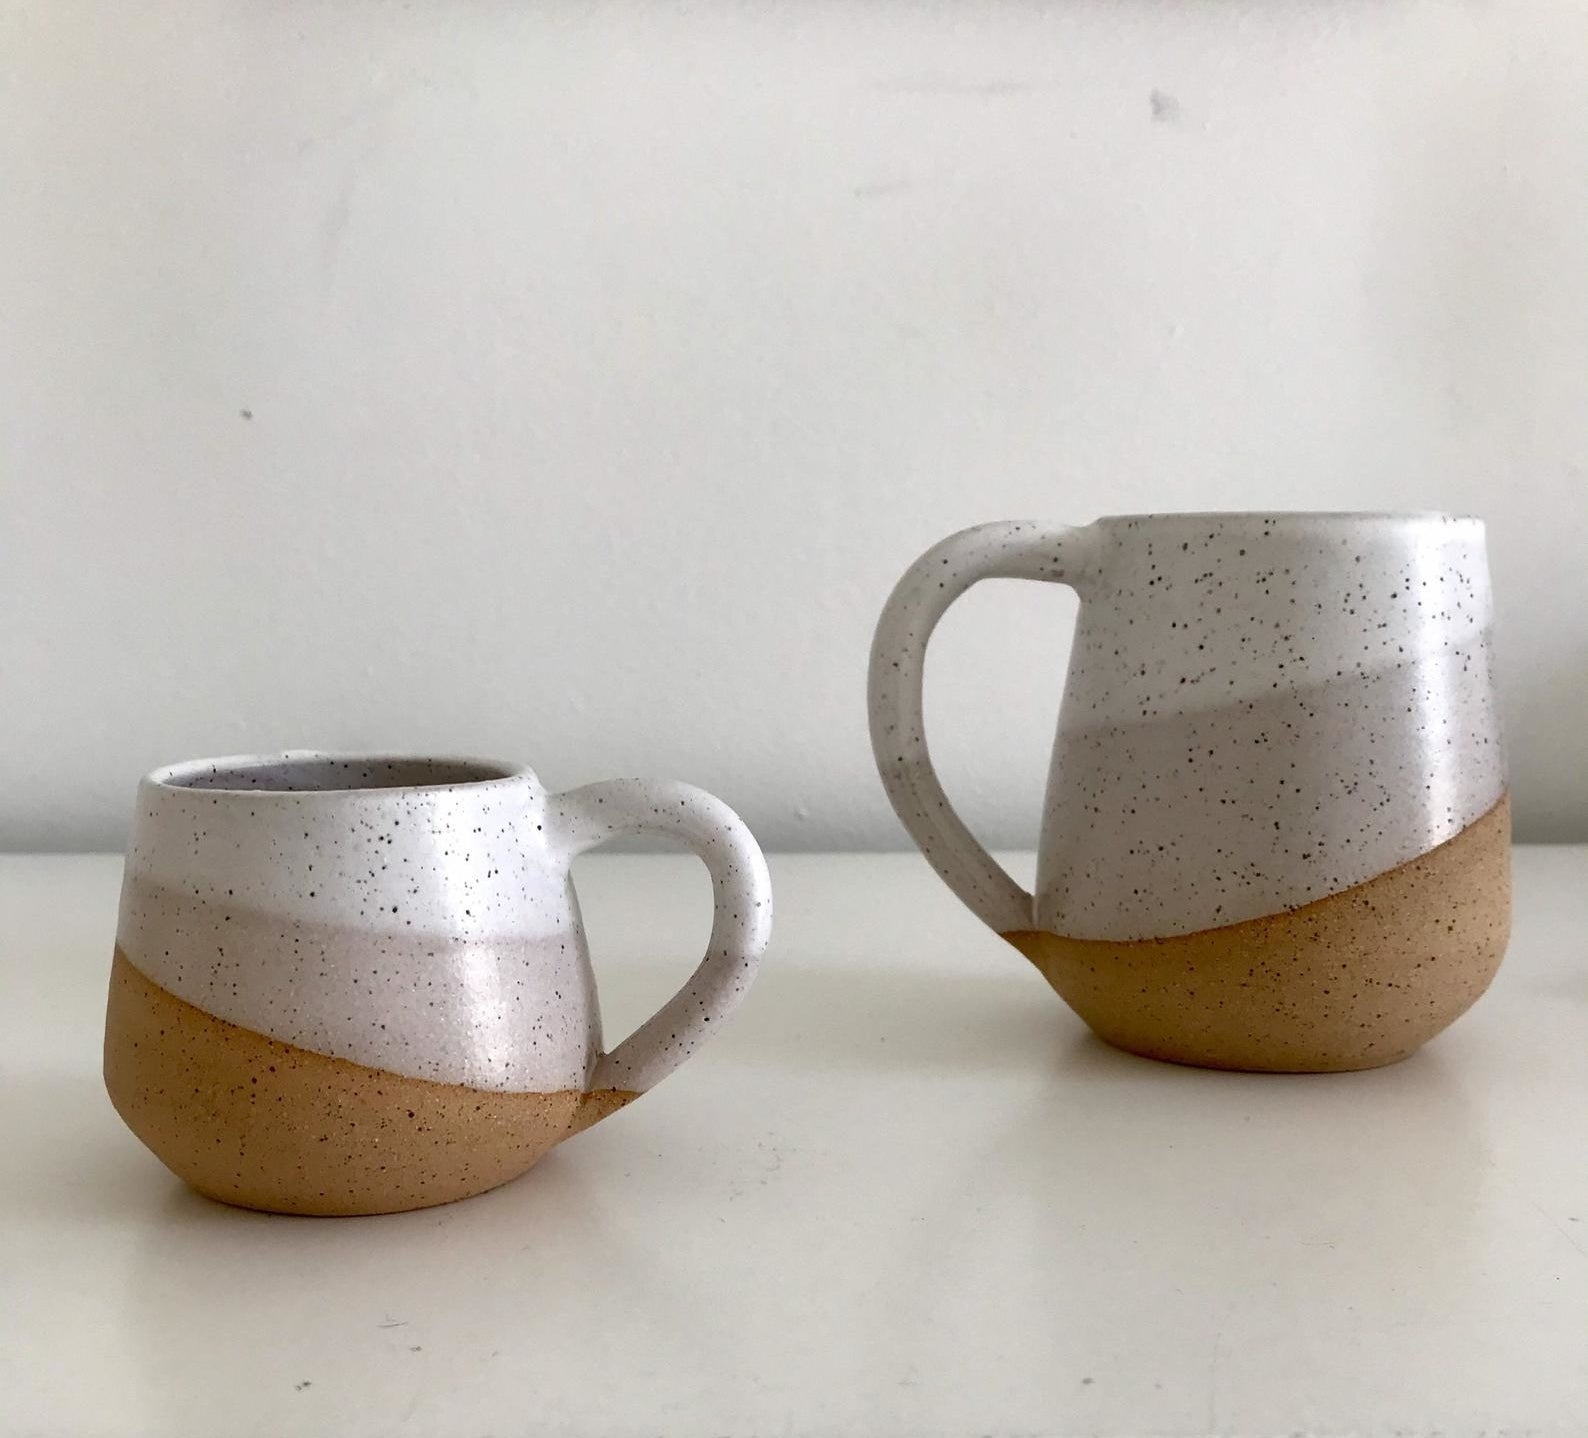 a speckled and white ceramic espresso cup and coffee mug